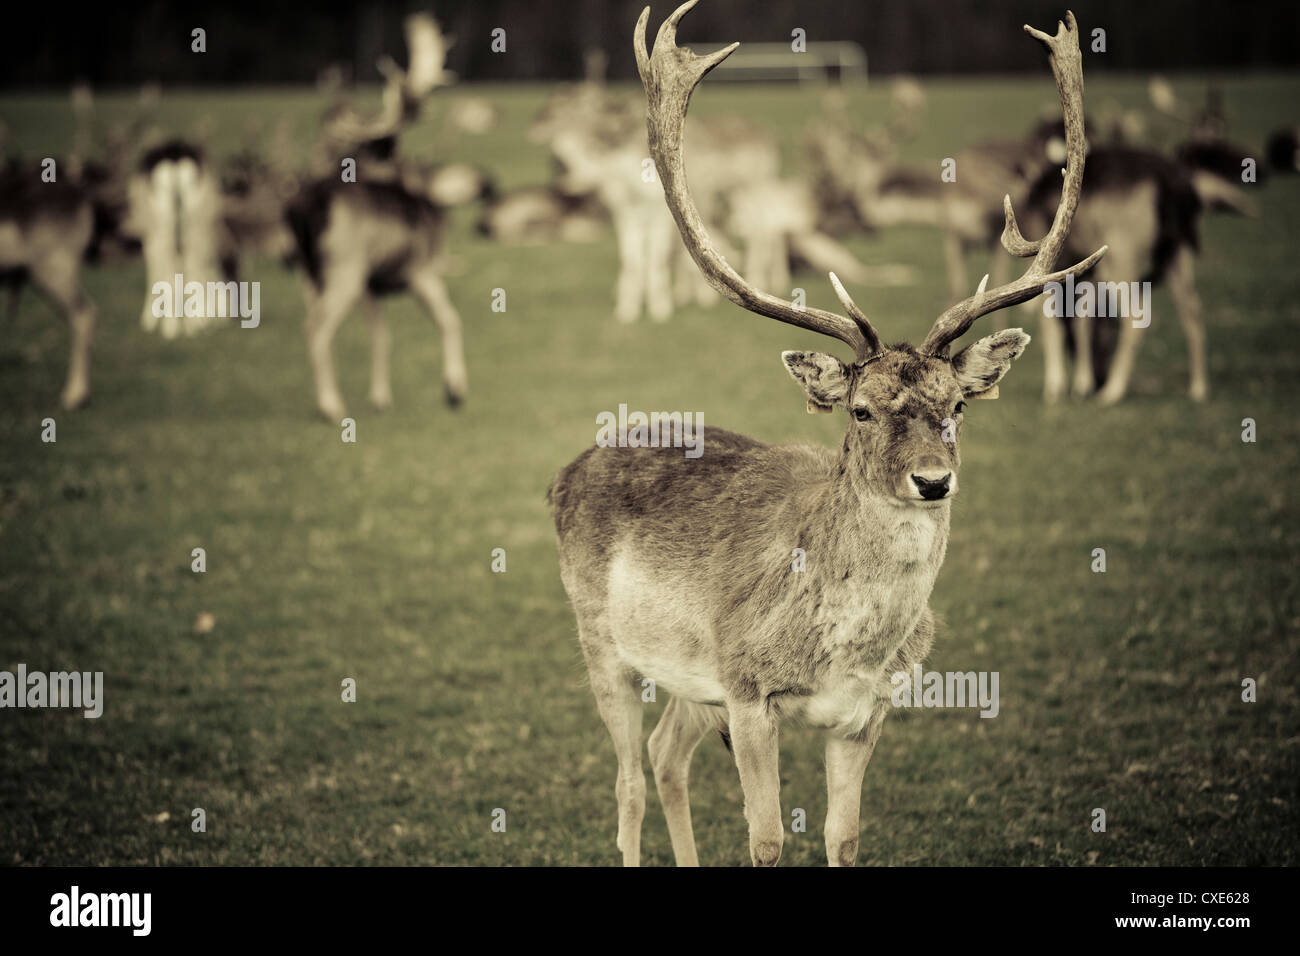 Stag with herd of deer in Phoenix Park, Dublin, Republic of Ireland, Europe - Stock Image